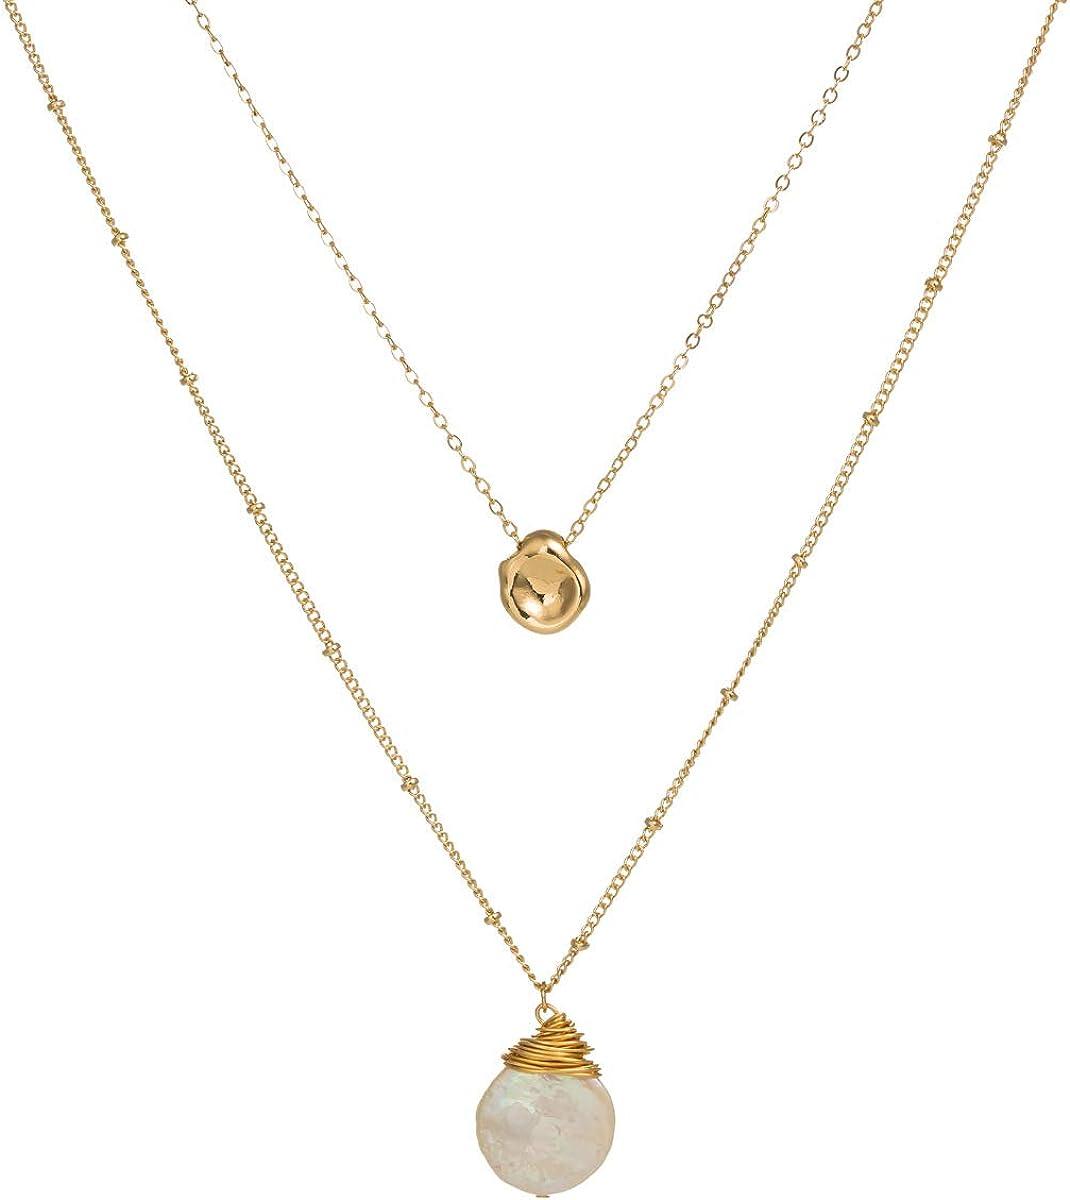 QKL Clásico Collar Doble Tejido A Mano Femenino, Perla Natural con Forma Barroca + Colgante De Frijol Dorado